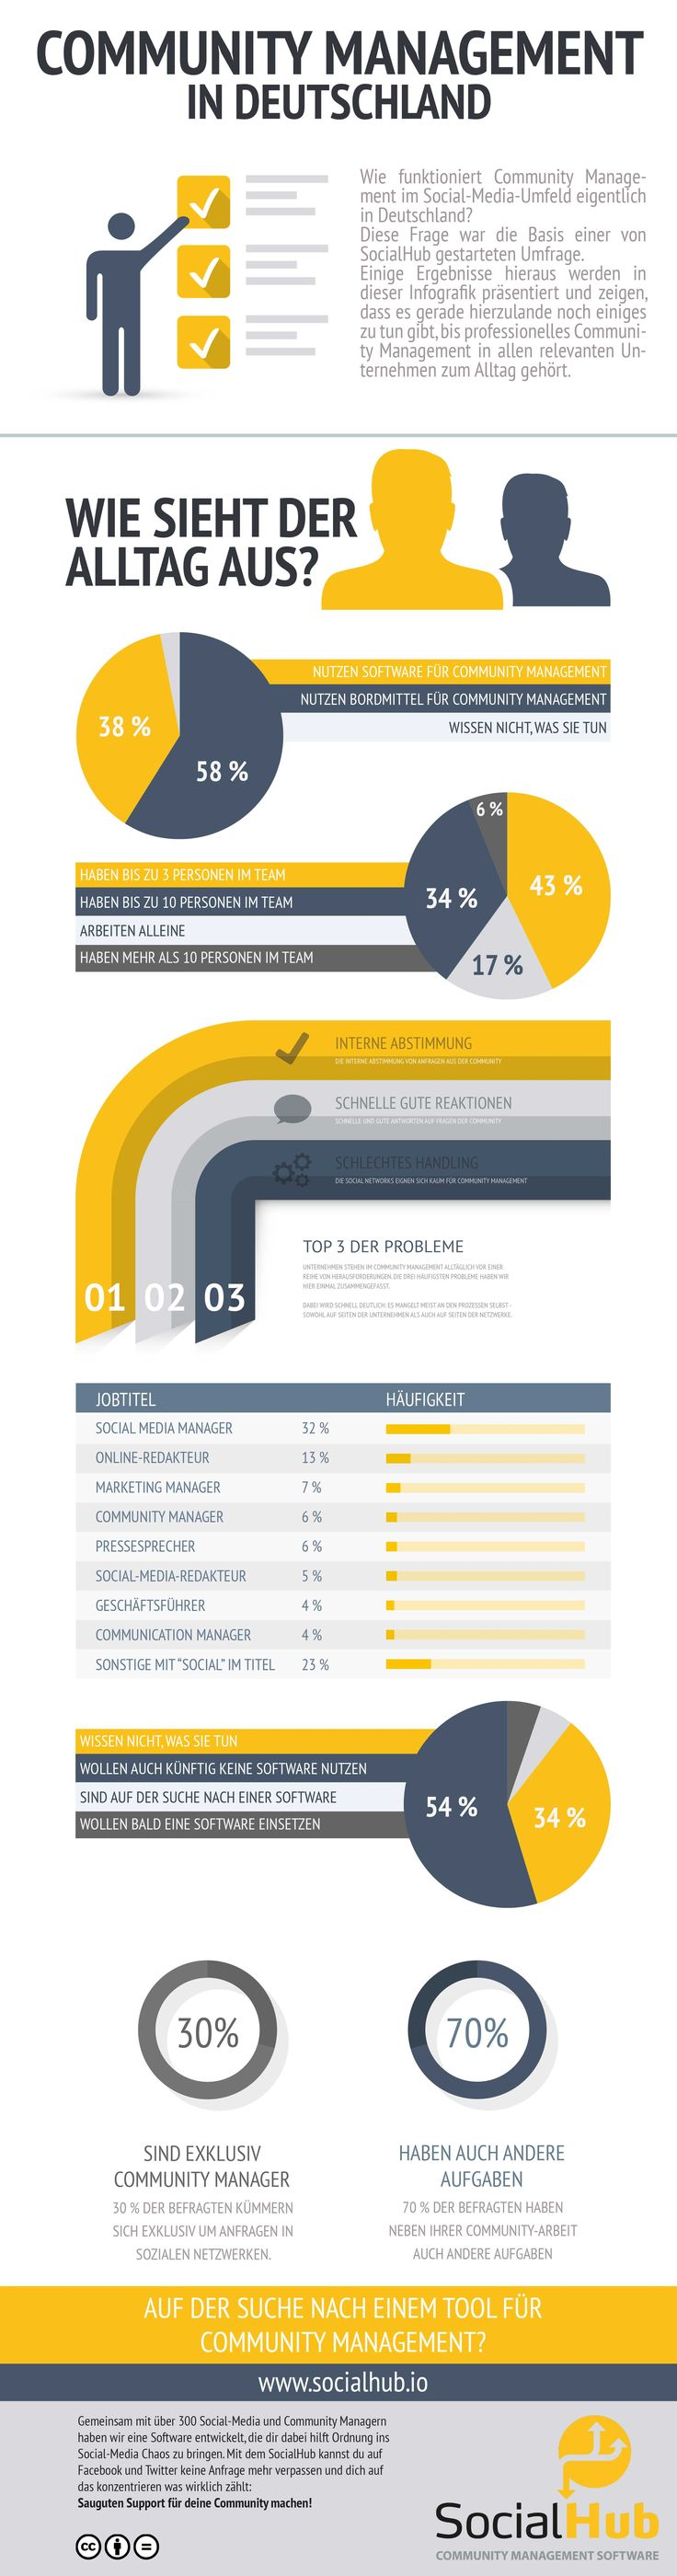 Infografik: Community Management in Deutschland - @SocialHub   Online Marketing Blog #SocialMedia #CommunityManagement